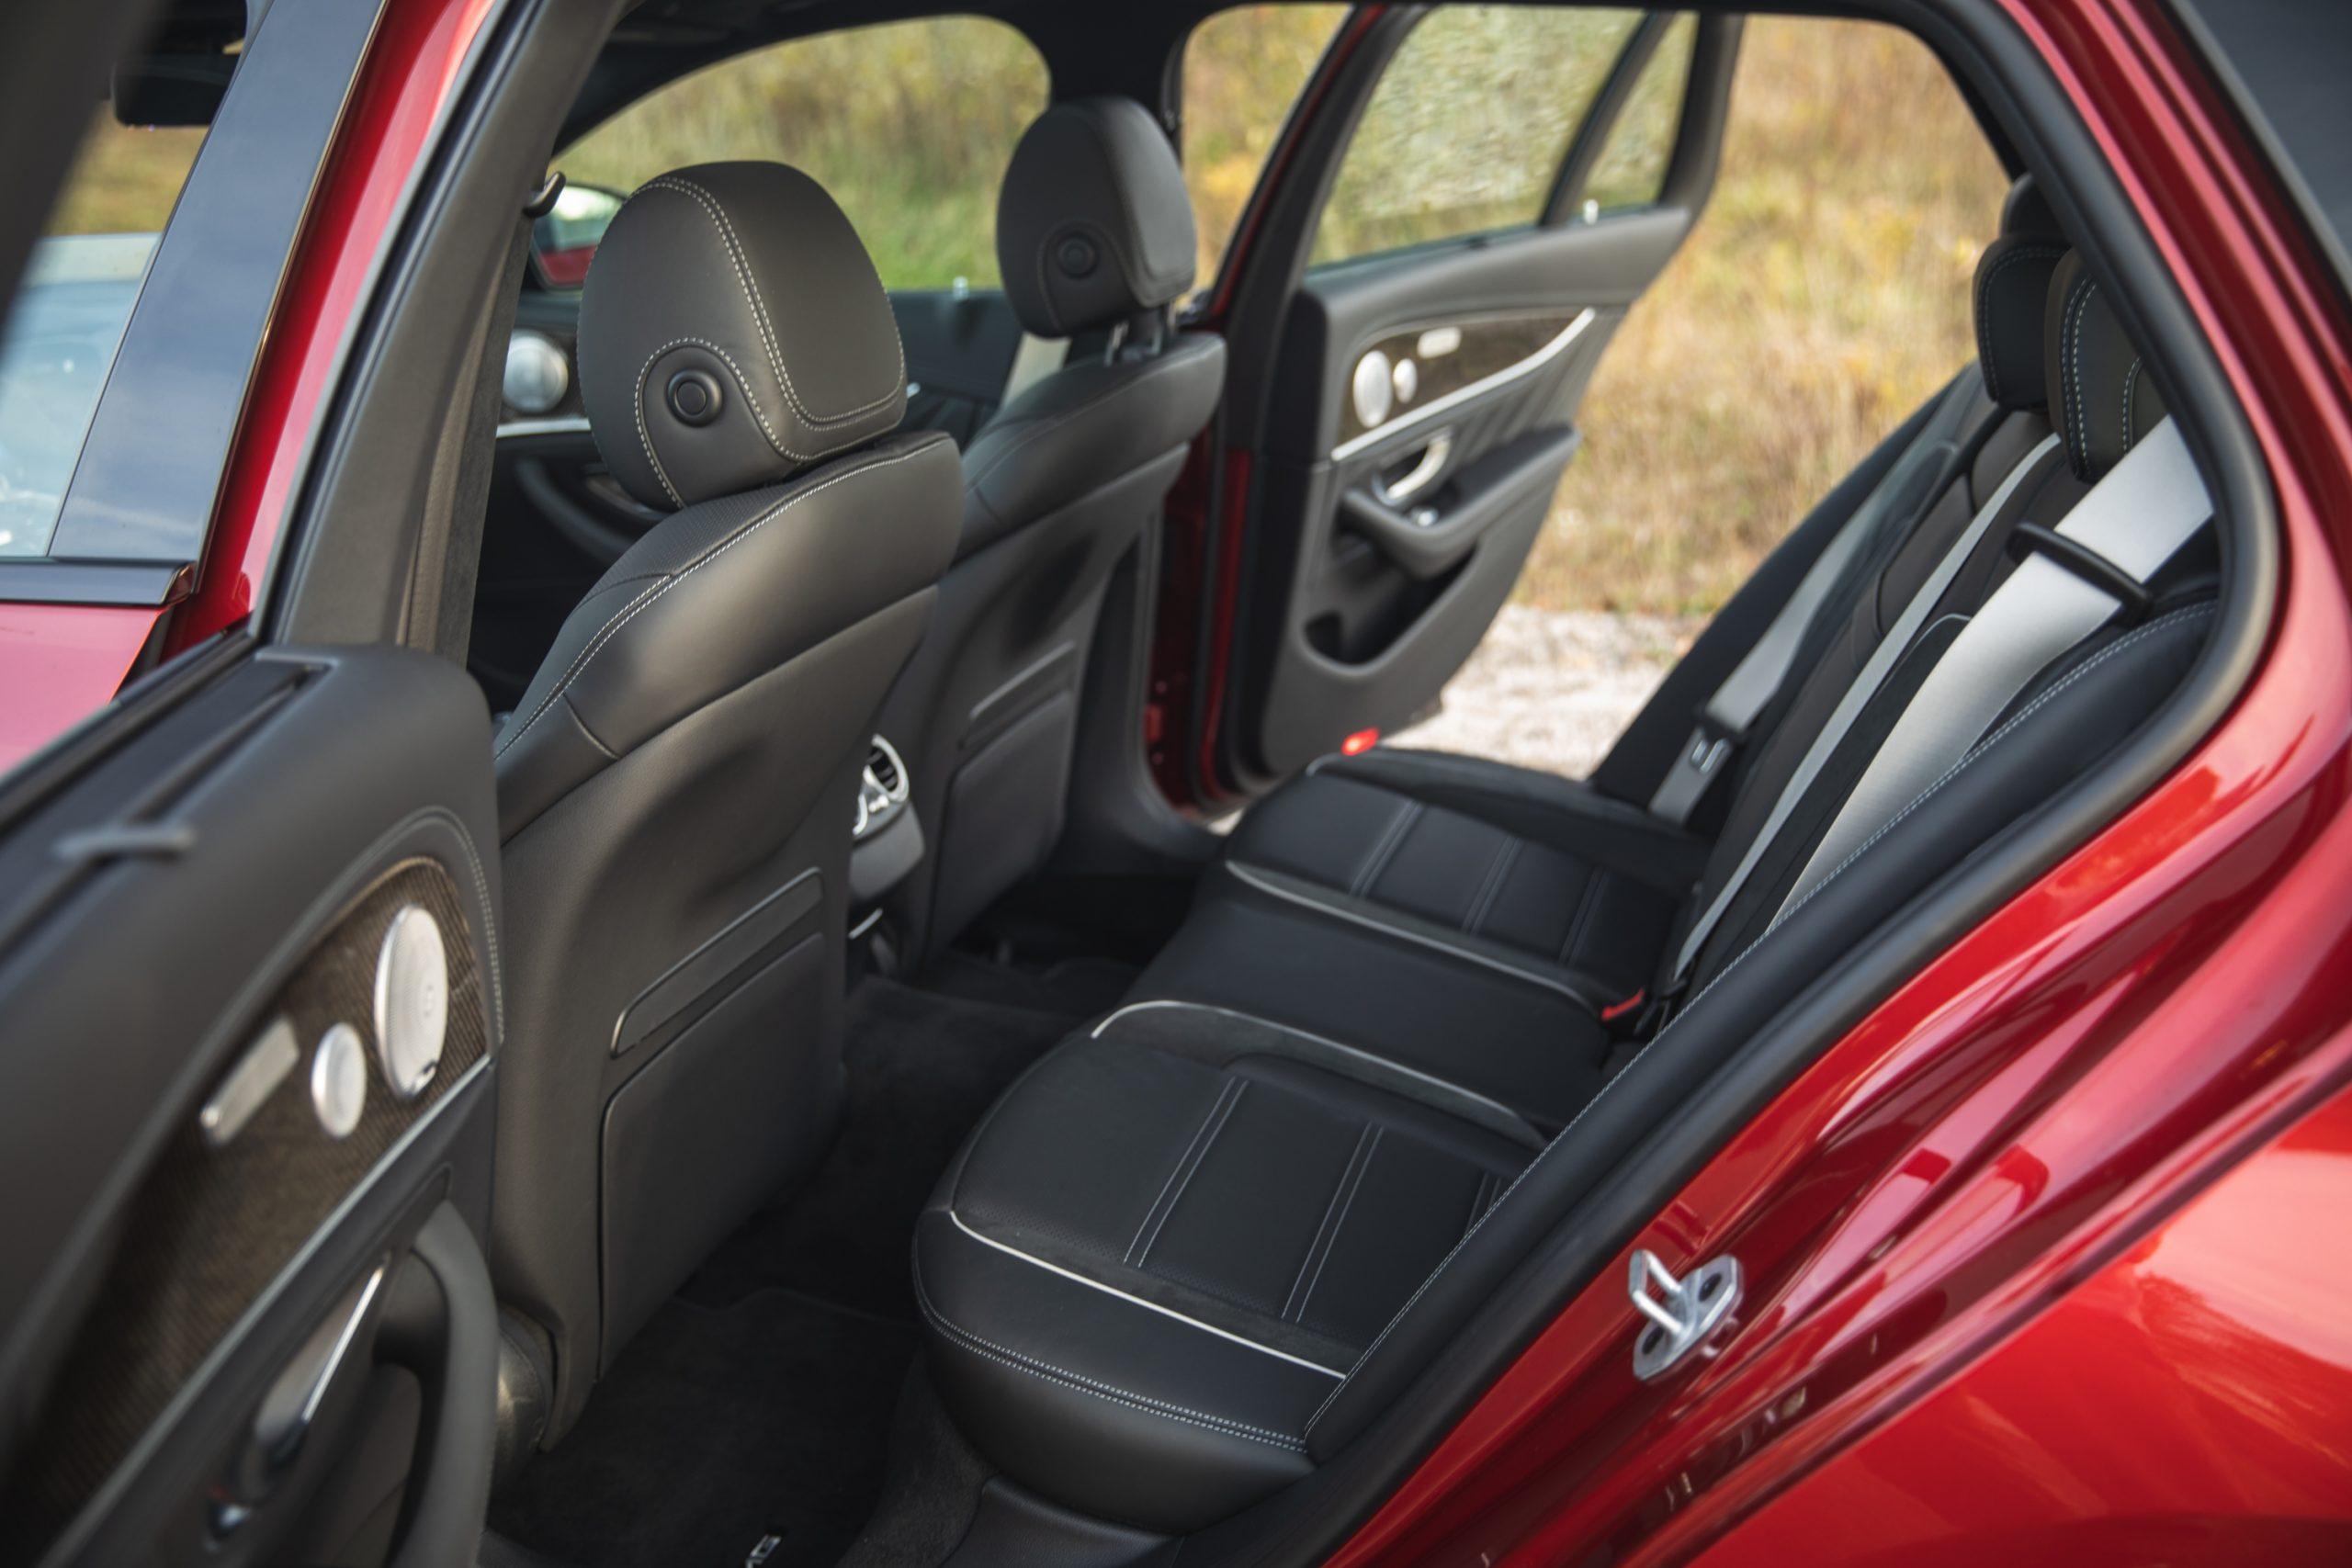 2021 Mercedes-AMG E63 S wagon rear seat room